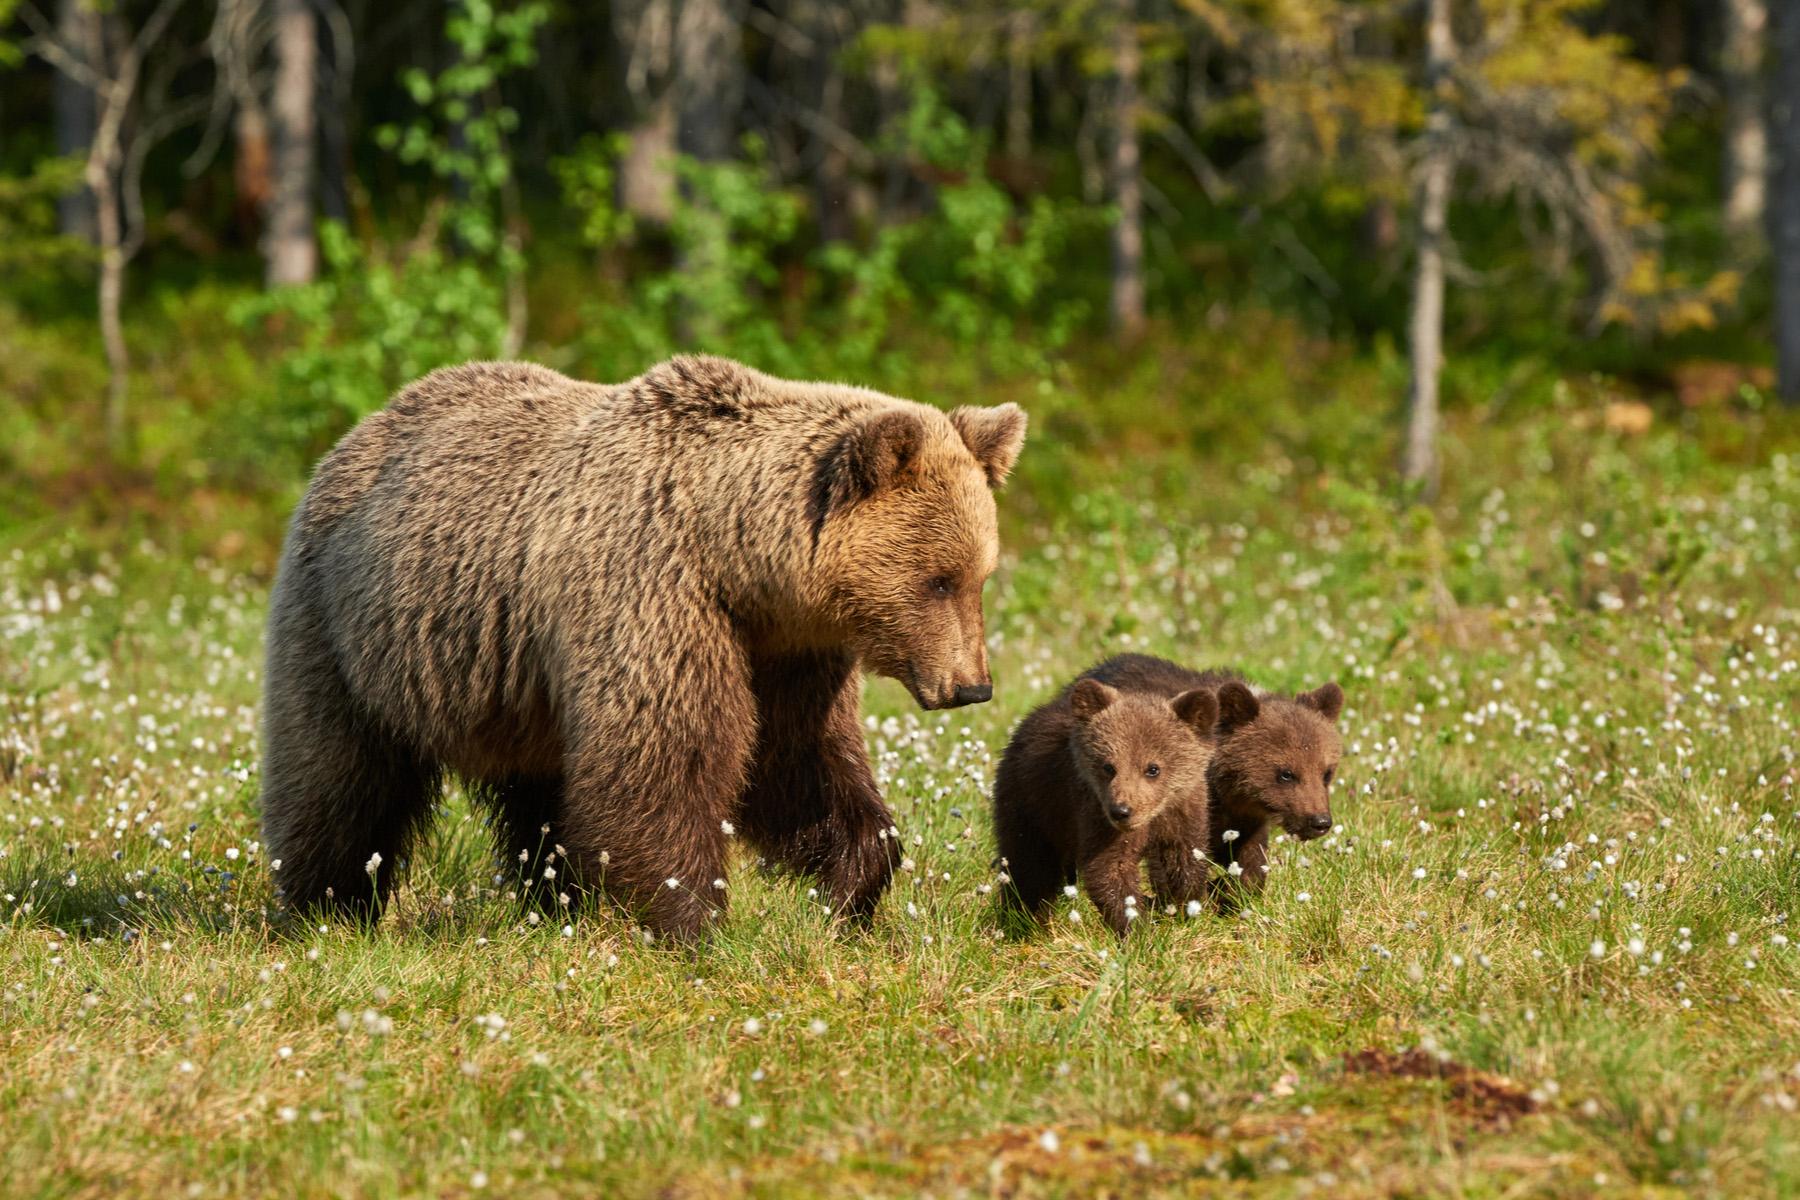 Sustainable tourism: bears in Wild Taiga, Finland